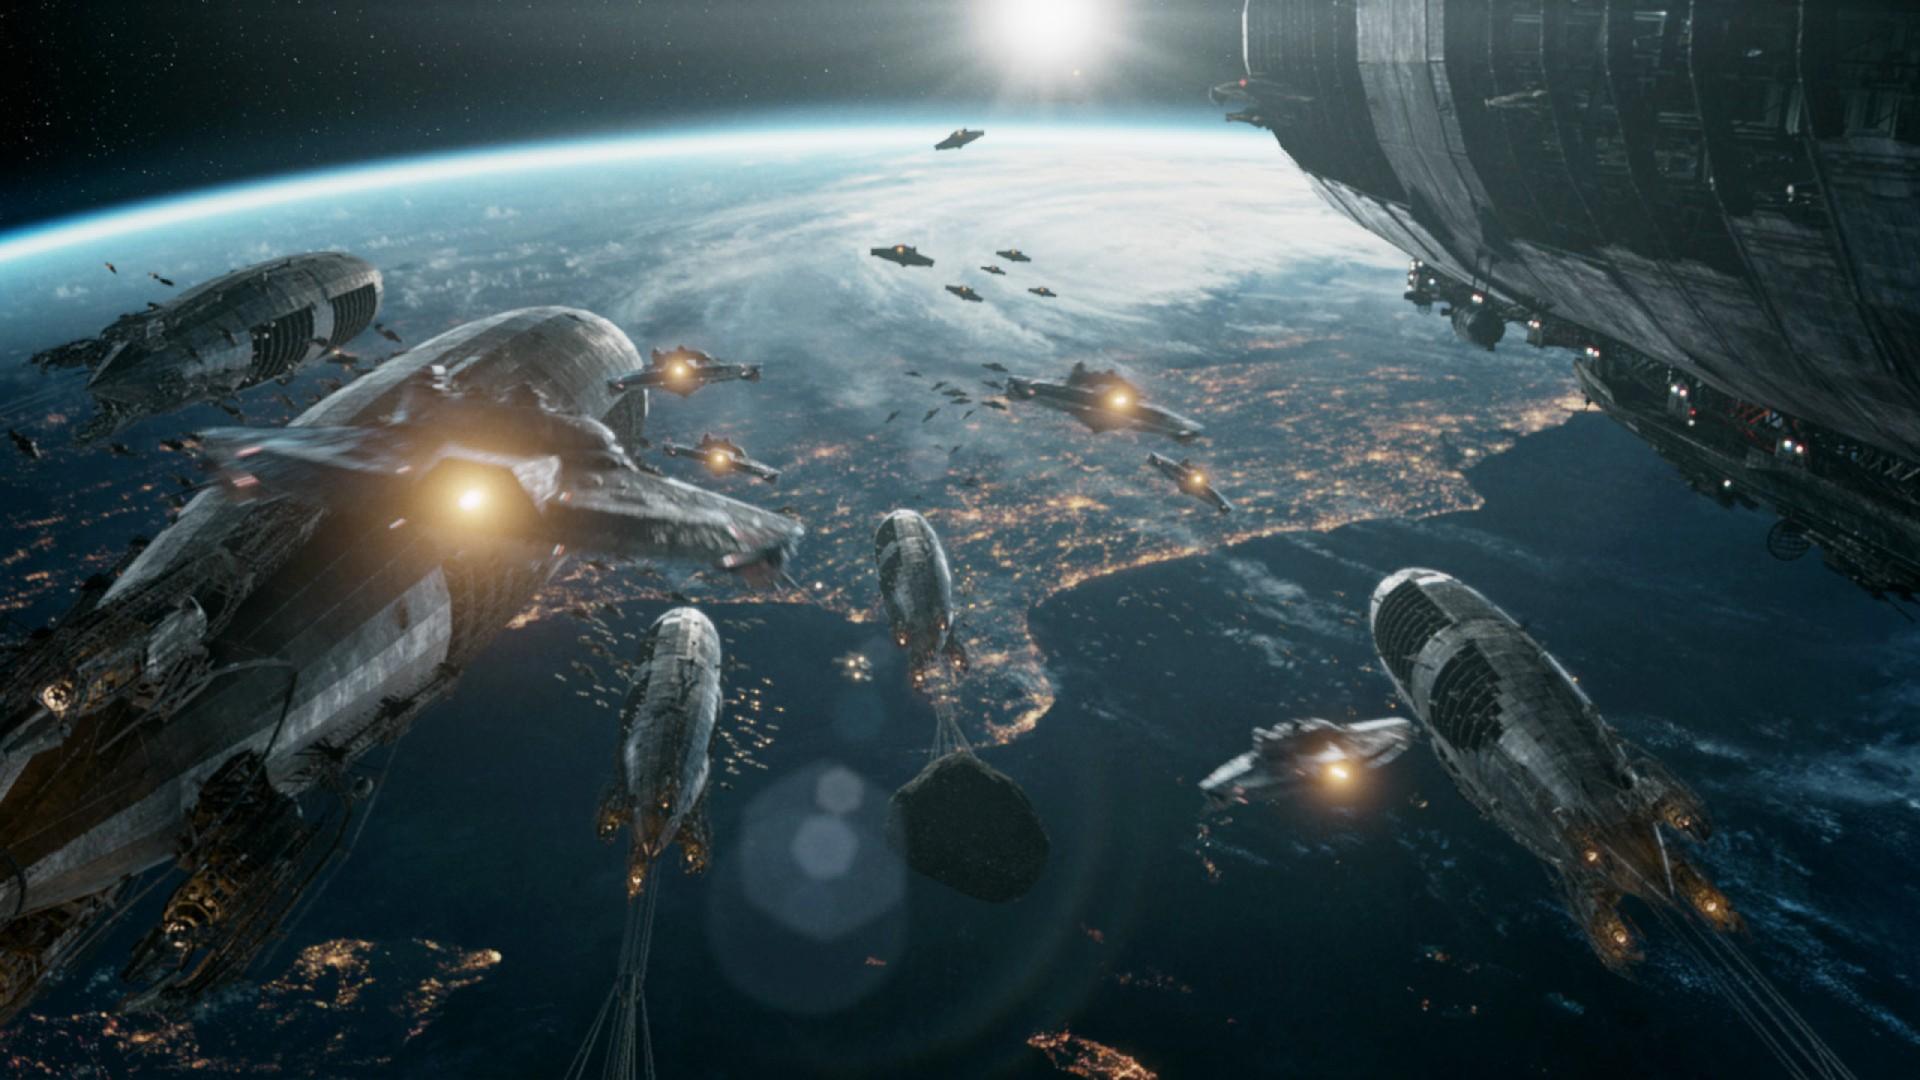 Кадр из фильма «Железное небо» (Iron Sky)